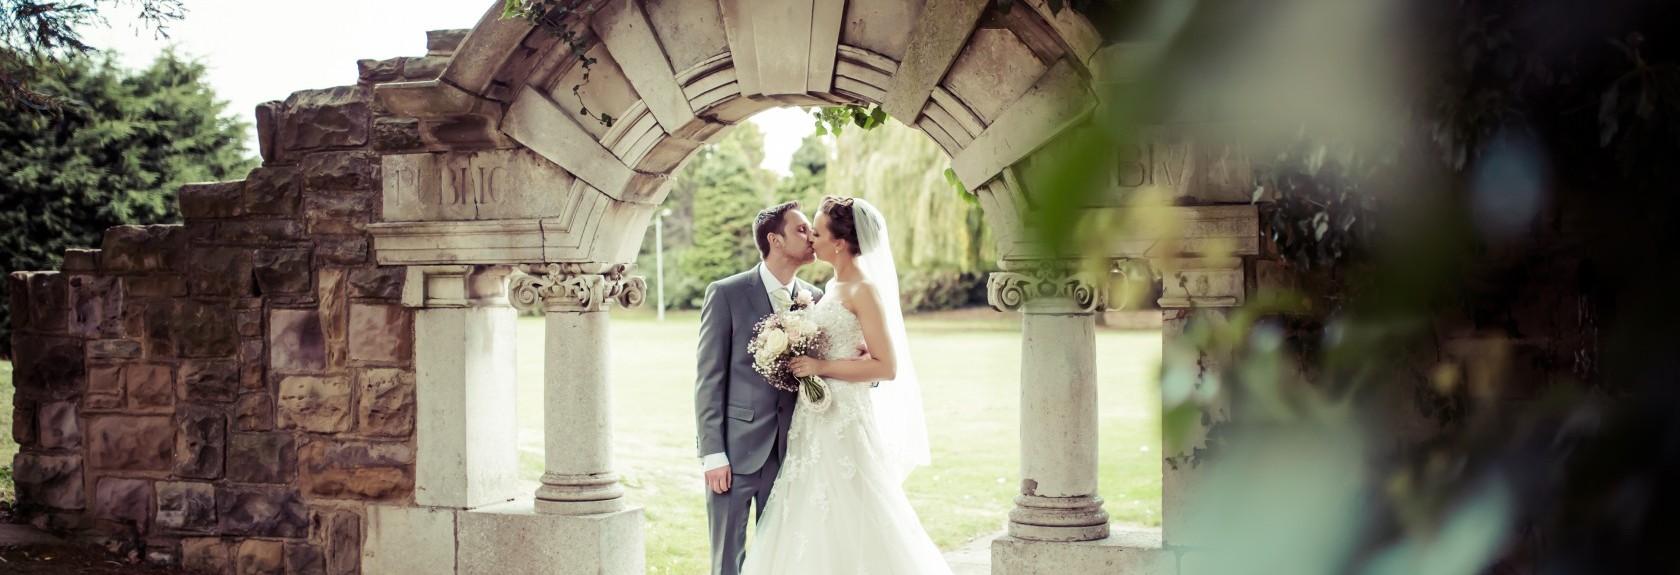 Bride and groom, wedding kiss